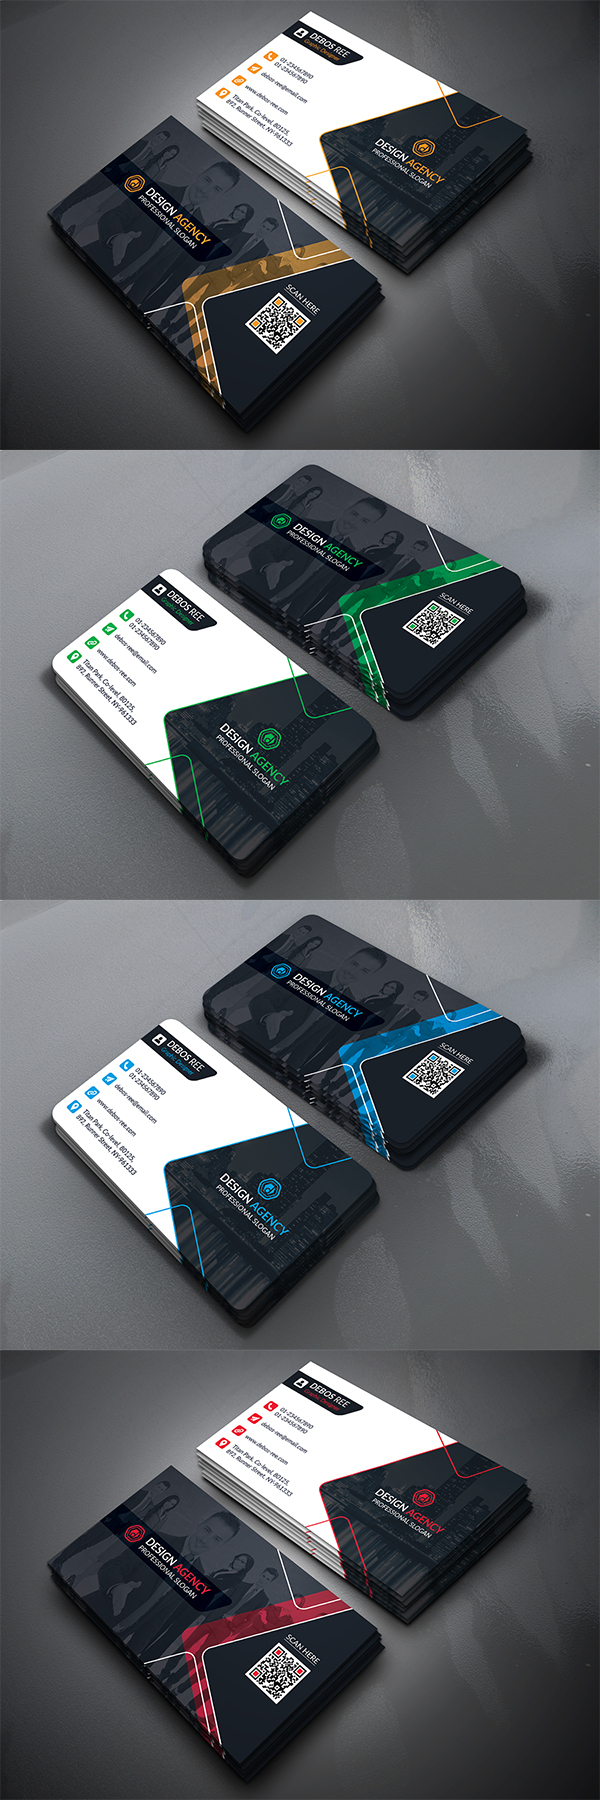 14 Business Card Design